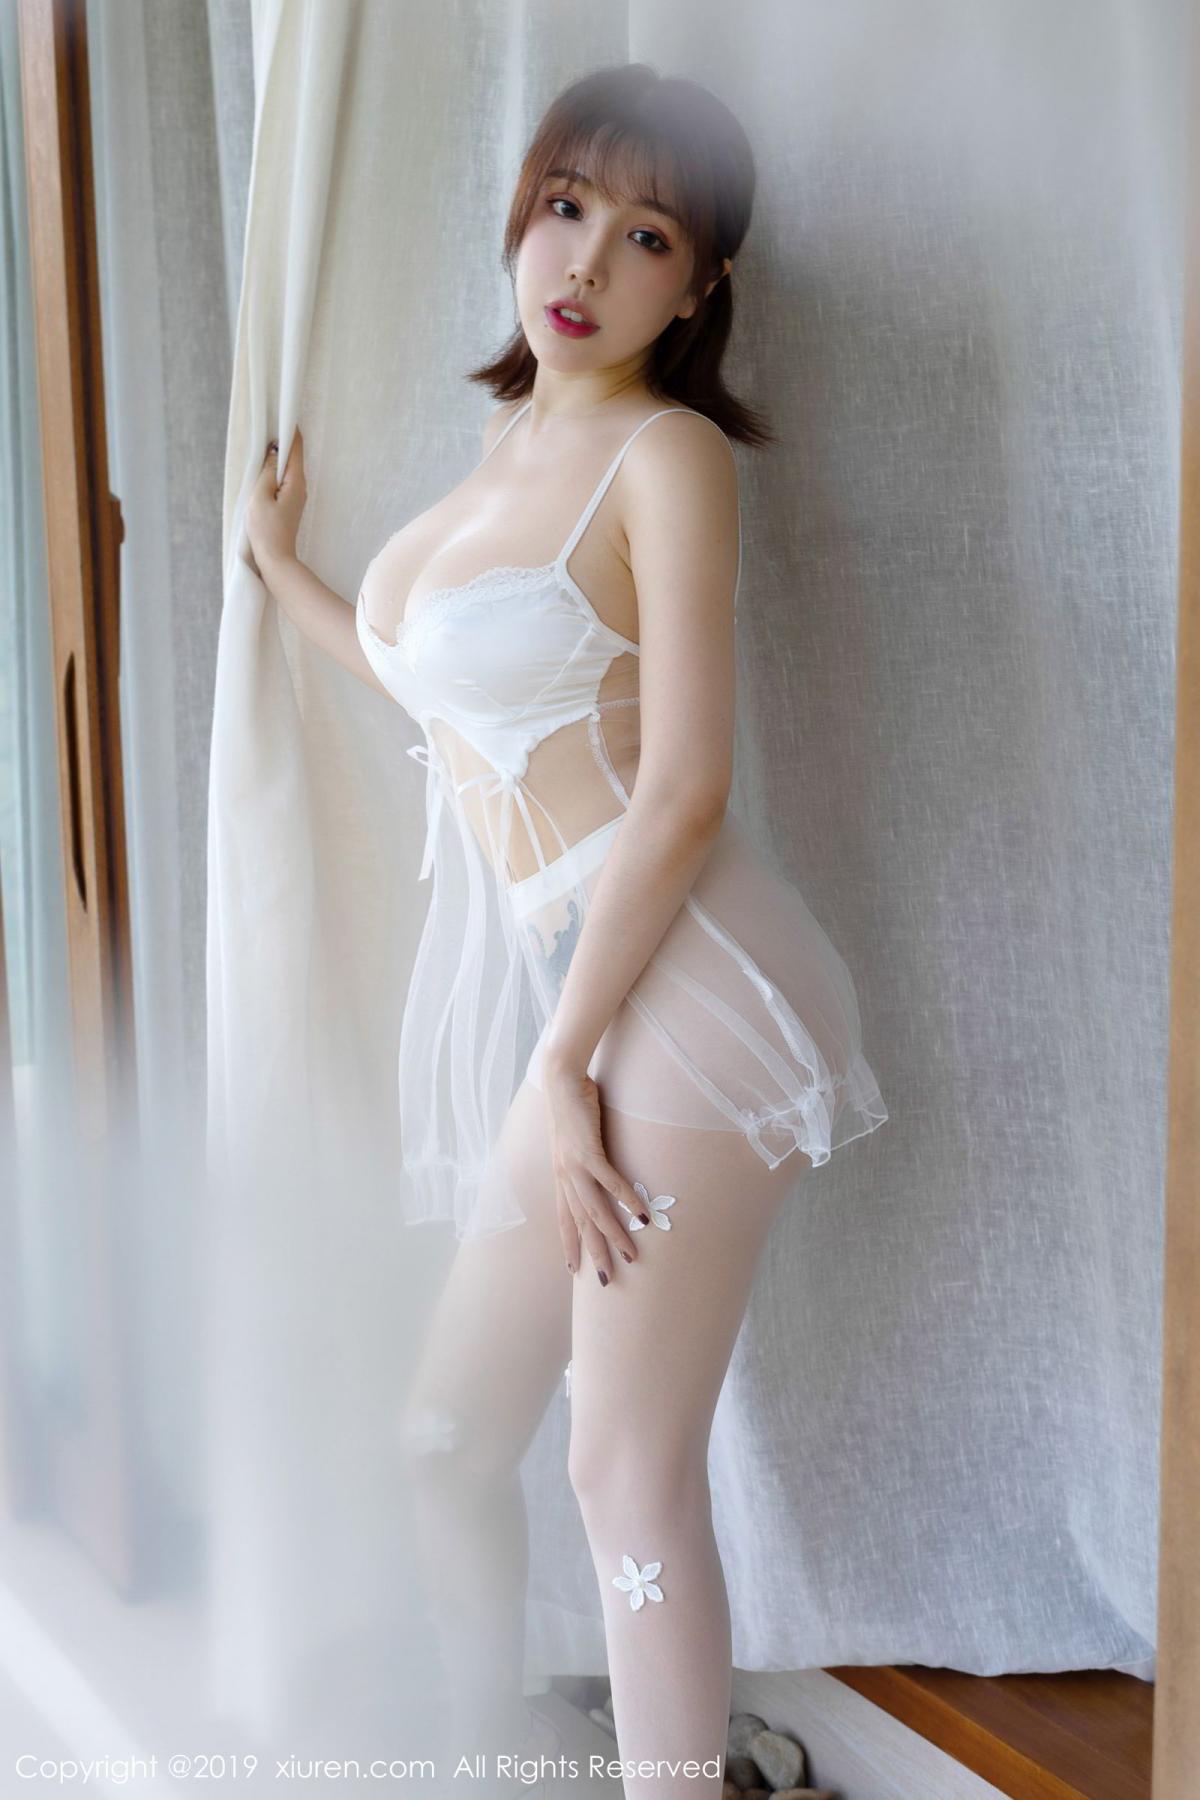 [XiuRen] Vol.1578 Huang Le Ran 3P, Huang Le Ran, Underwear, Xiuren